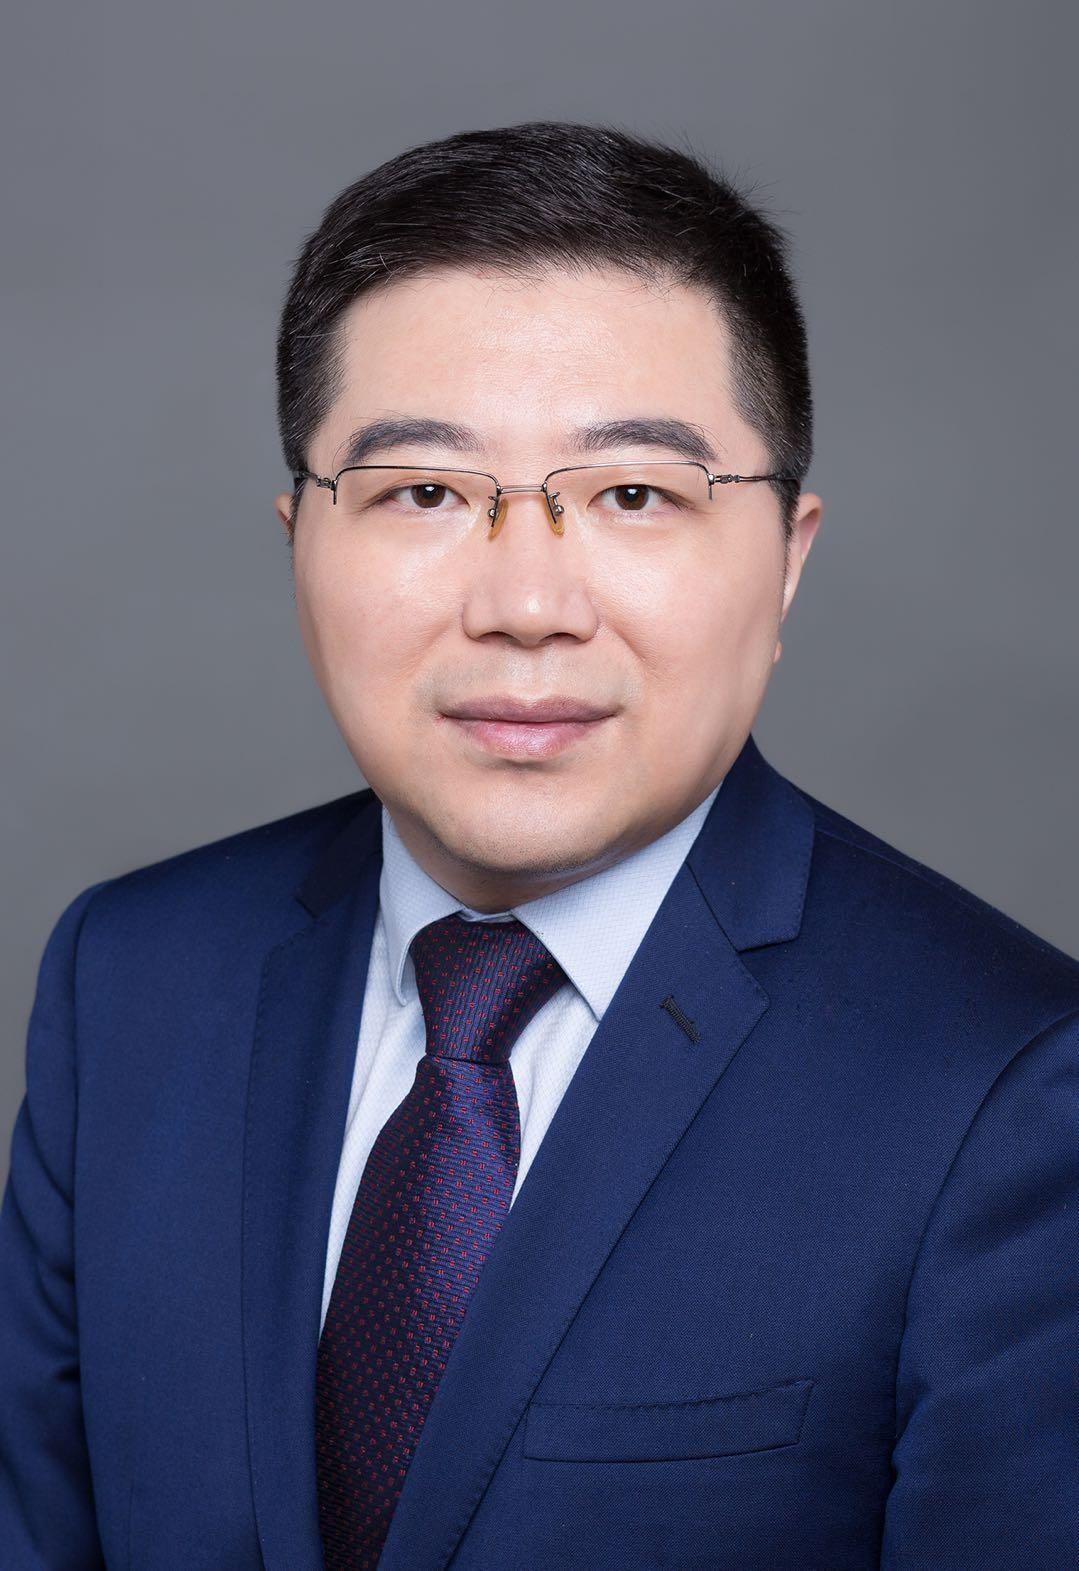 e成科技总裁、创始合伙人、咨询+首席架构师梁星晖